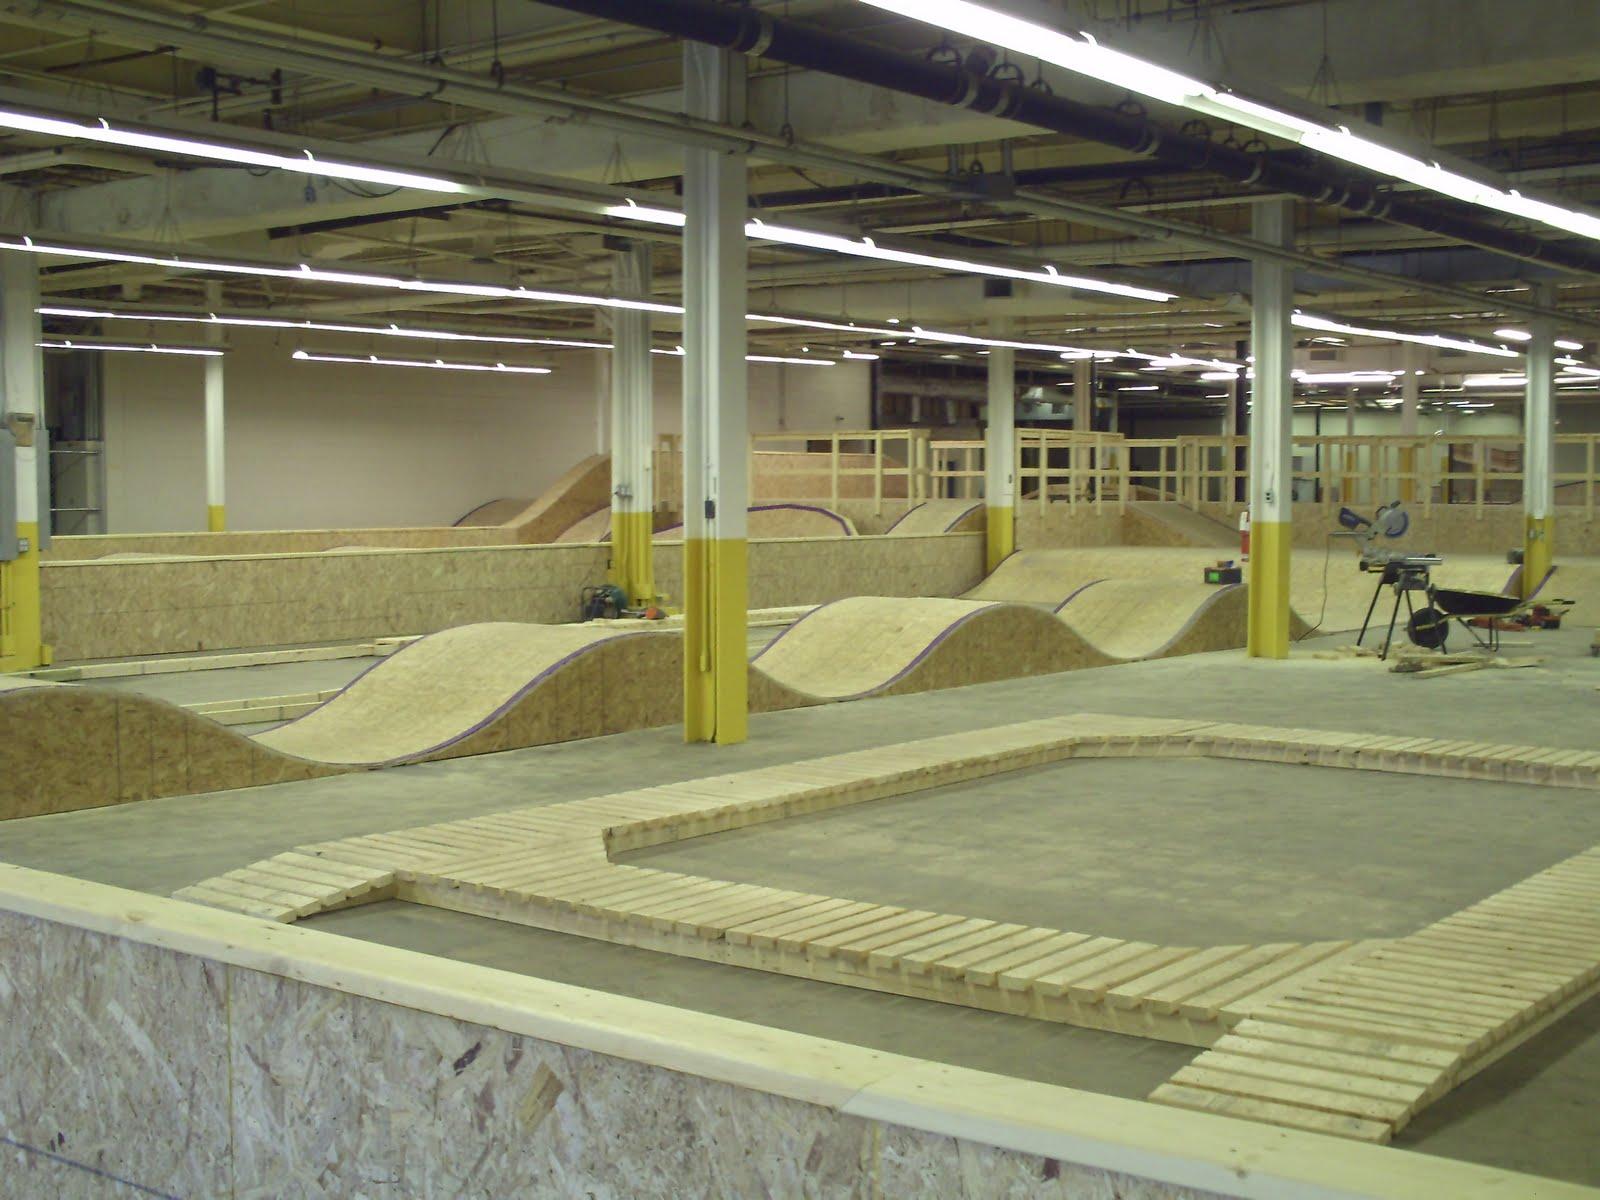 bmx indoor track plan uci bmx worlds bmx track 3d plans unvieled